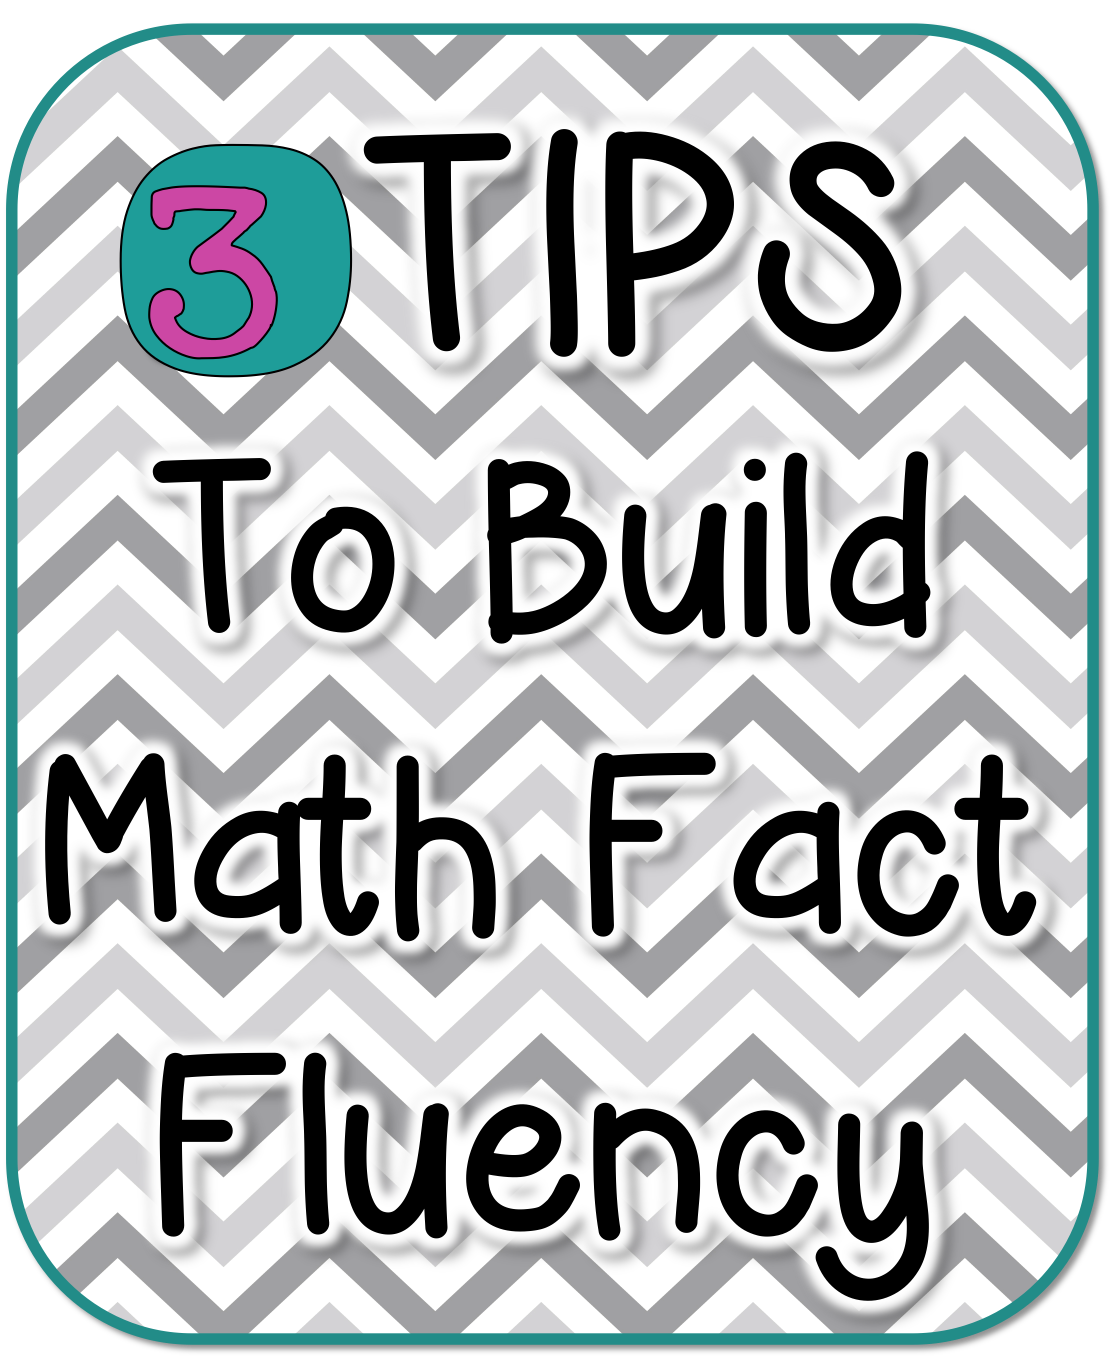 3 Tips To Build Math Fact Fluency